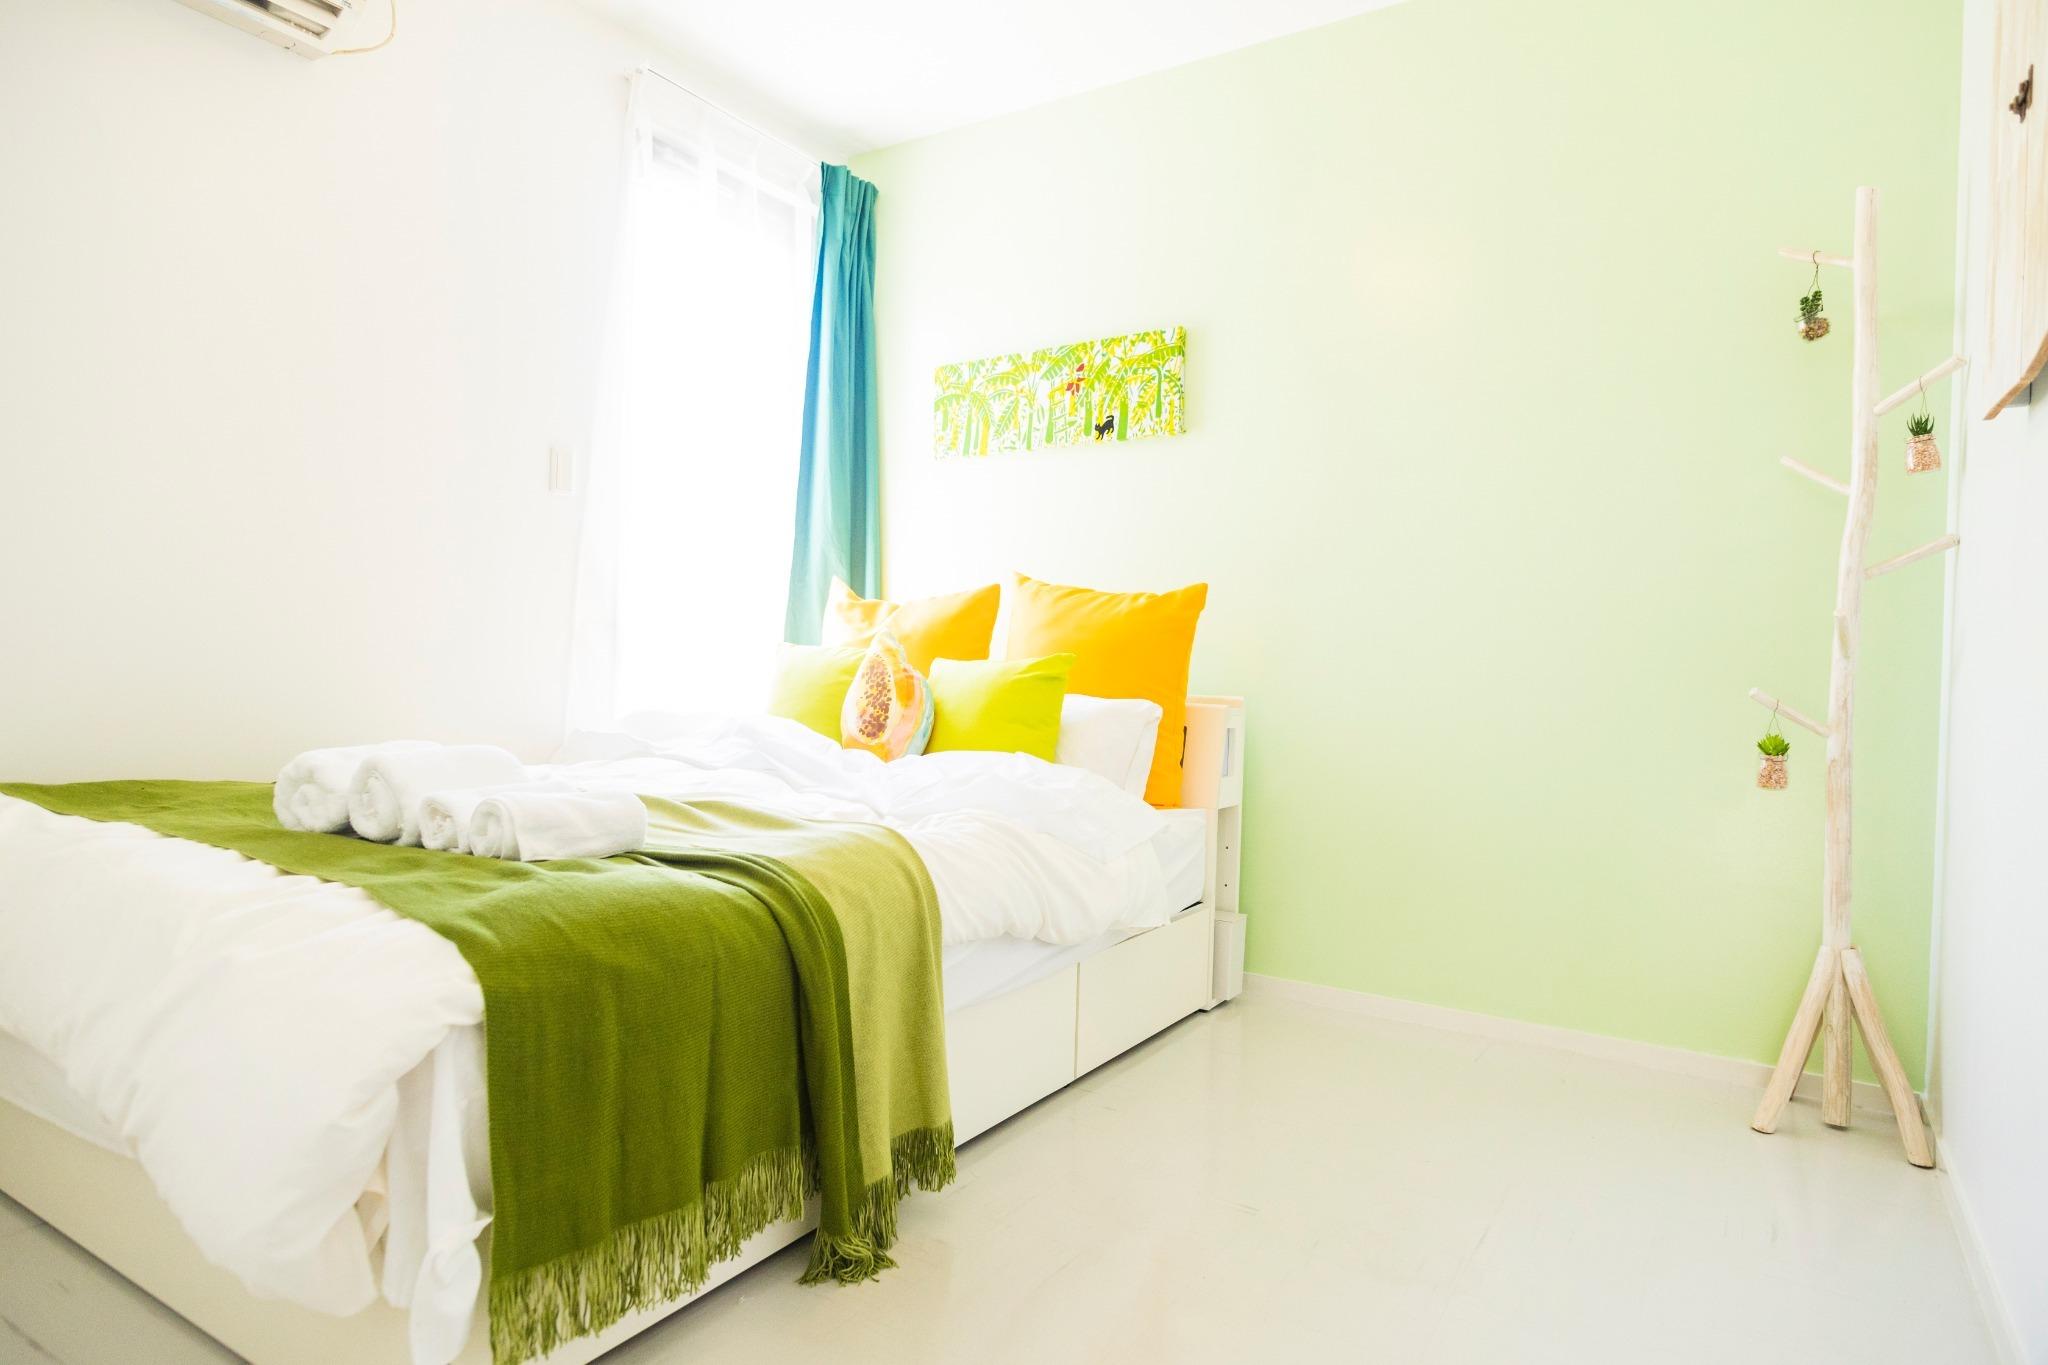 Green bed room: double-size bed×1, Folding single-size bed×1 グリーンベッドルーム:ダブルベッド×1、折り畳みシングルベッド×1